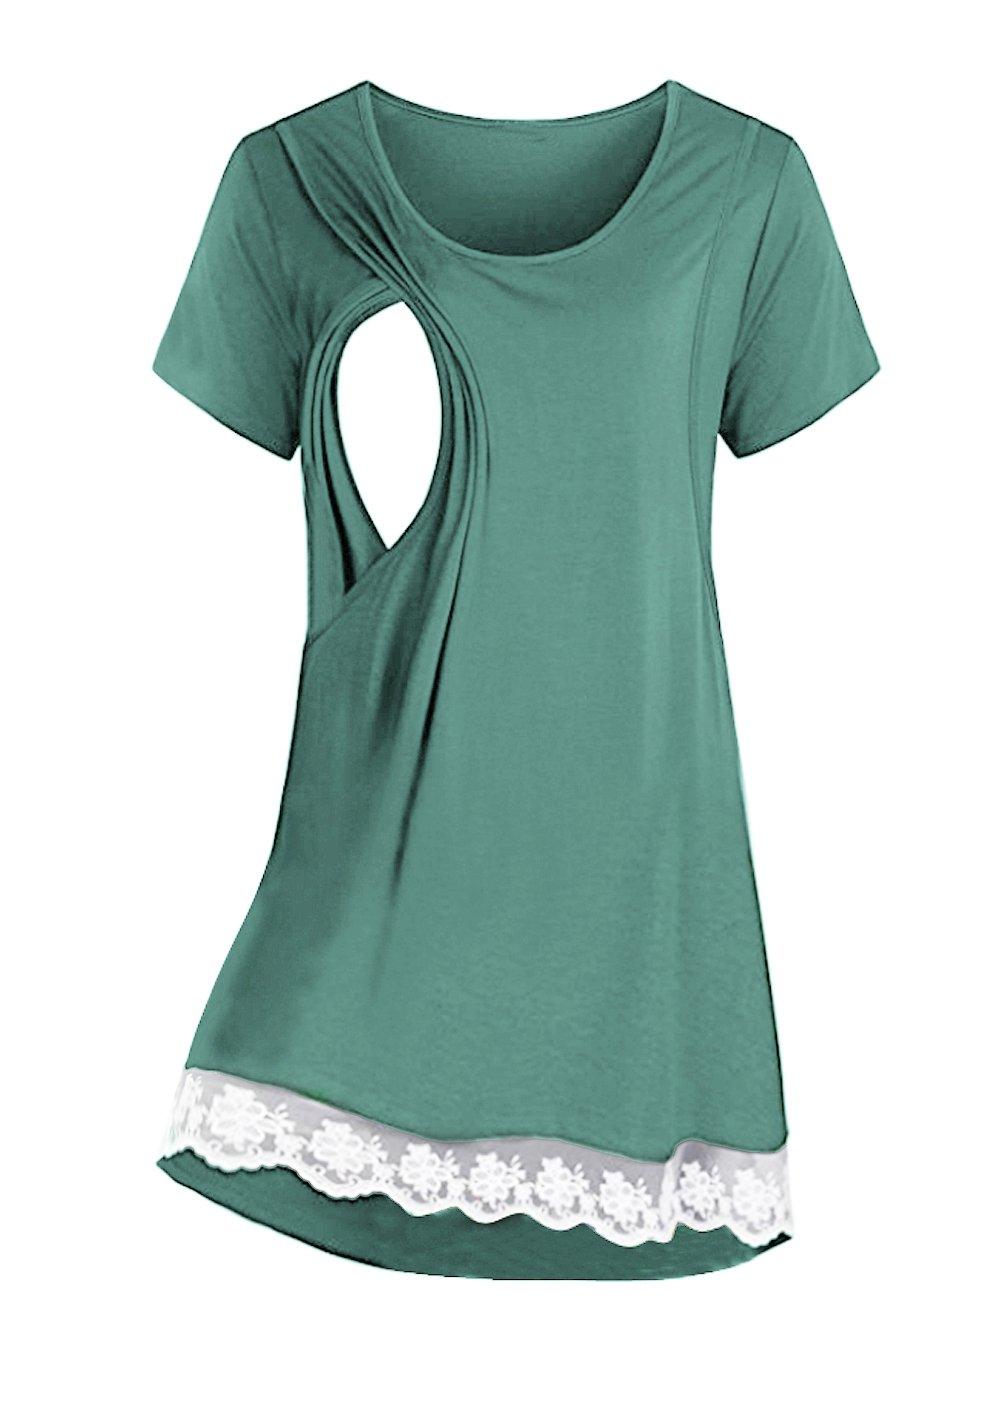 Saifeier PJ Women's Nursing Tops Summer Lace Breastfeeding T-Shirt Clothes(Blue Green,XL)